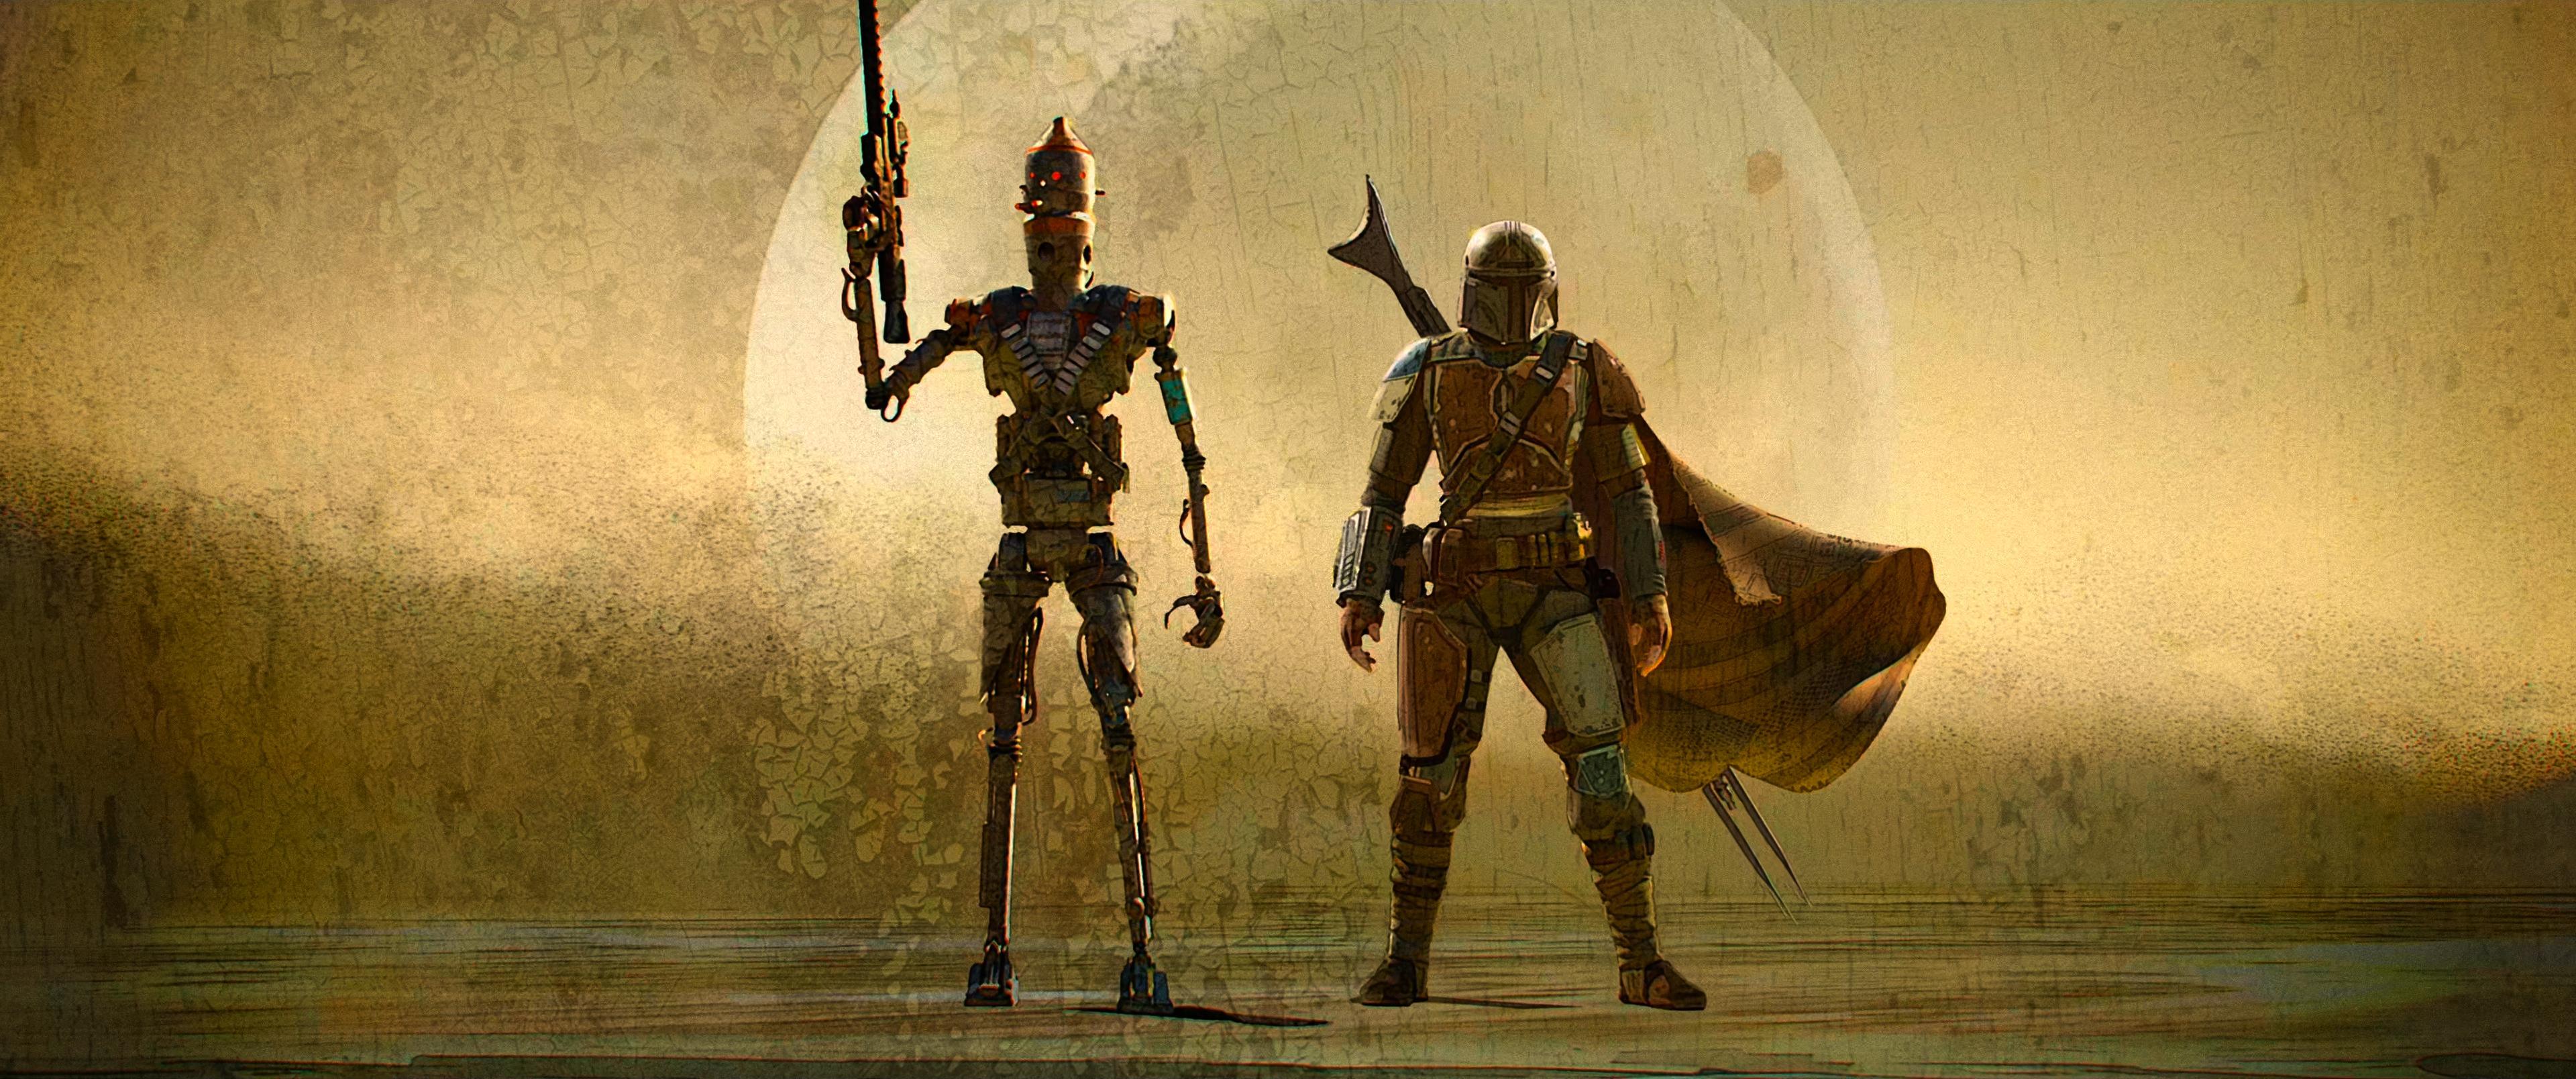 The Art Of Star Wars The Mandalorian End Credits Art 3 Geek Carl